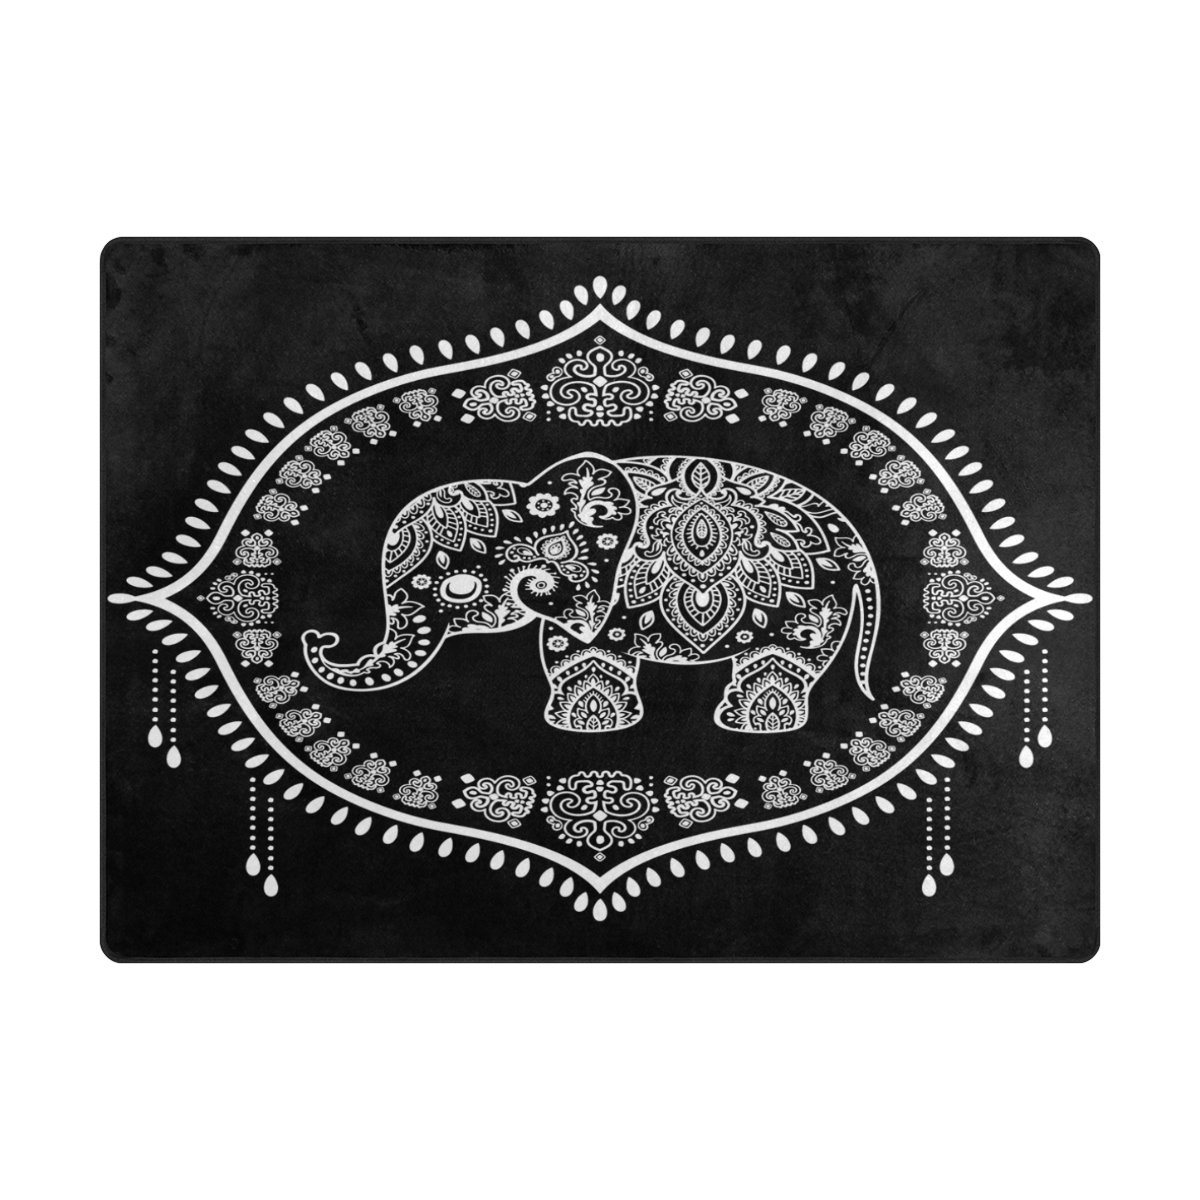 945f6b6178fa Amazon.com: ALAZA Indian Elephant Lotus Flower Ethnic Black Area Rug ...